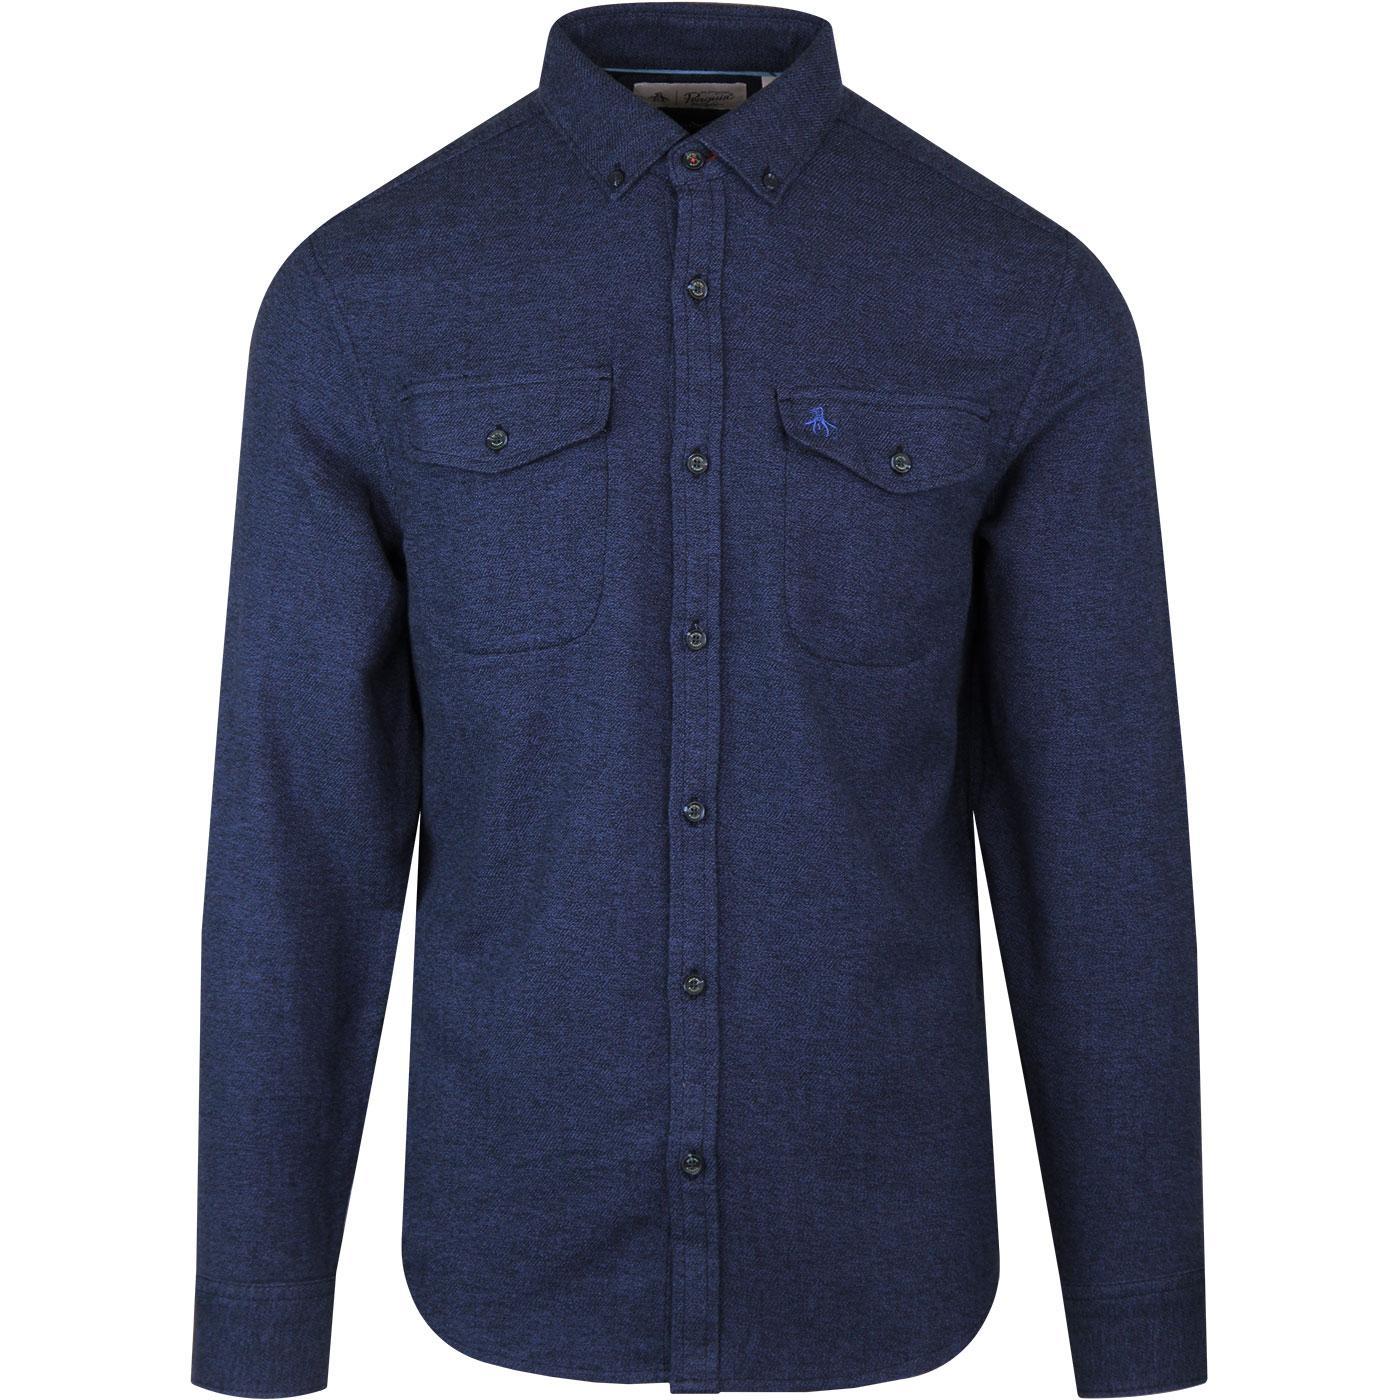 ORIGINAL PENGUIN 60s Mod Flannel Jaspe Shirt BLUE